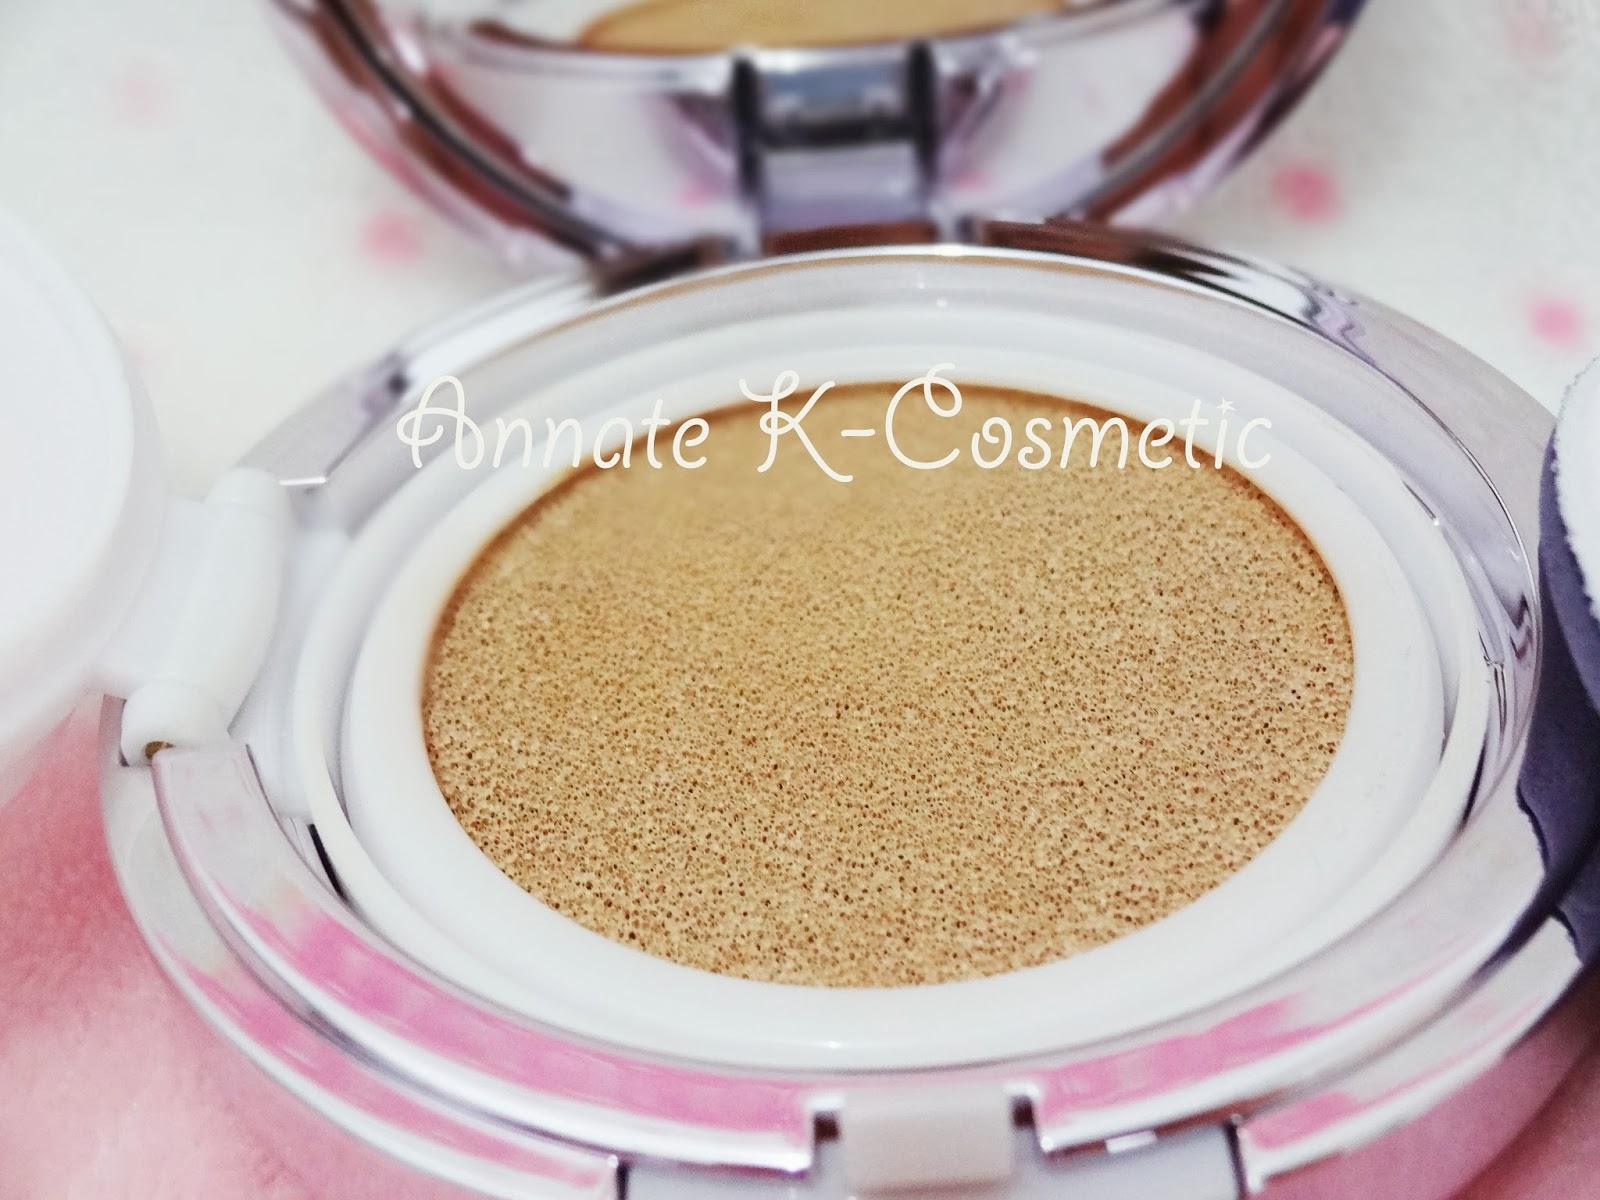 Beauty Blogger Online Shop Hera Uv Mist Cushion C21 Cool Vanila Bedak Compact Powder Spf 50 Pa Vanilla Cover